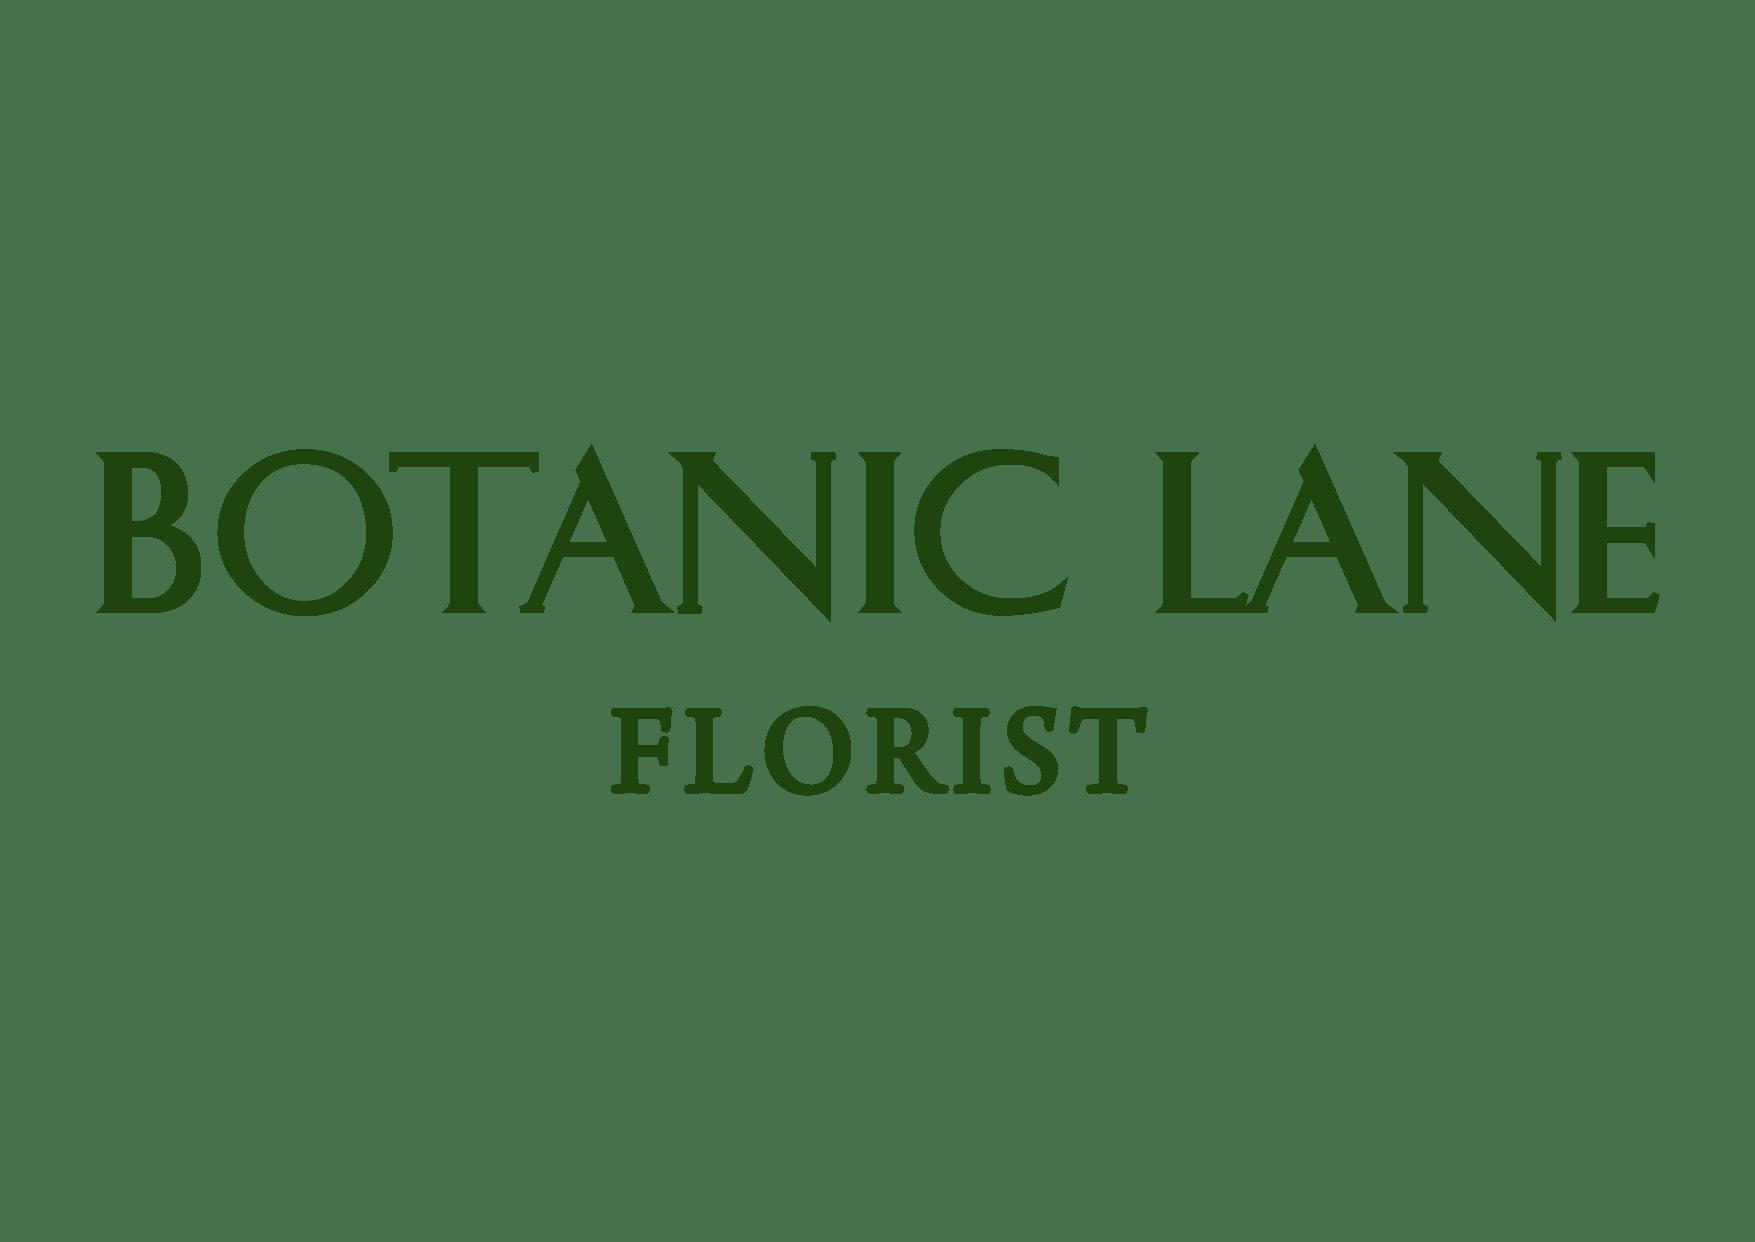 BONTANIC LANE 01